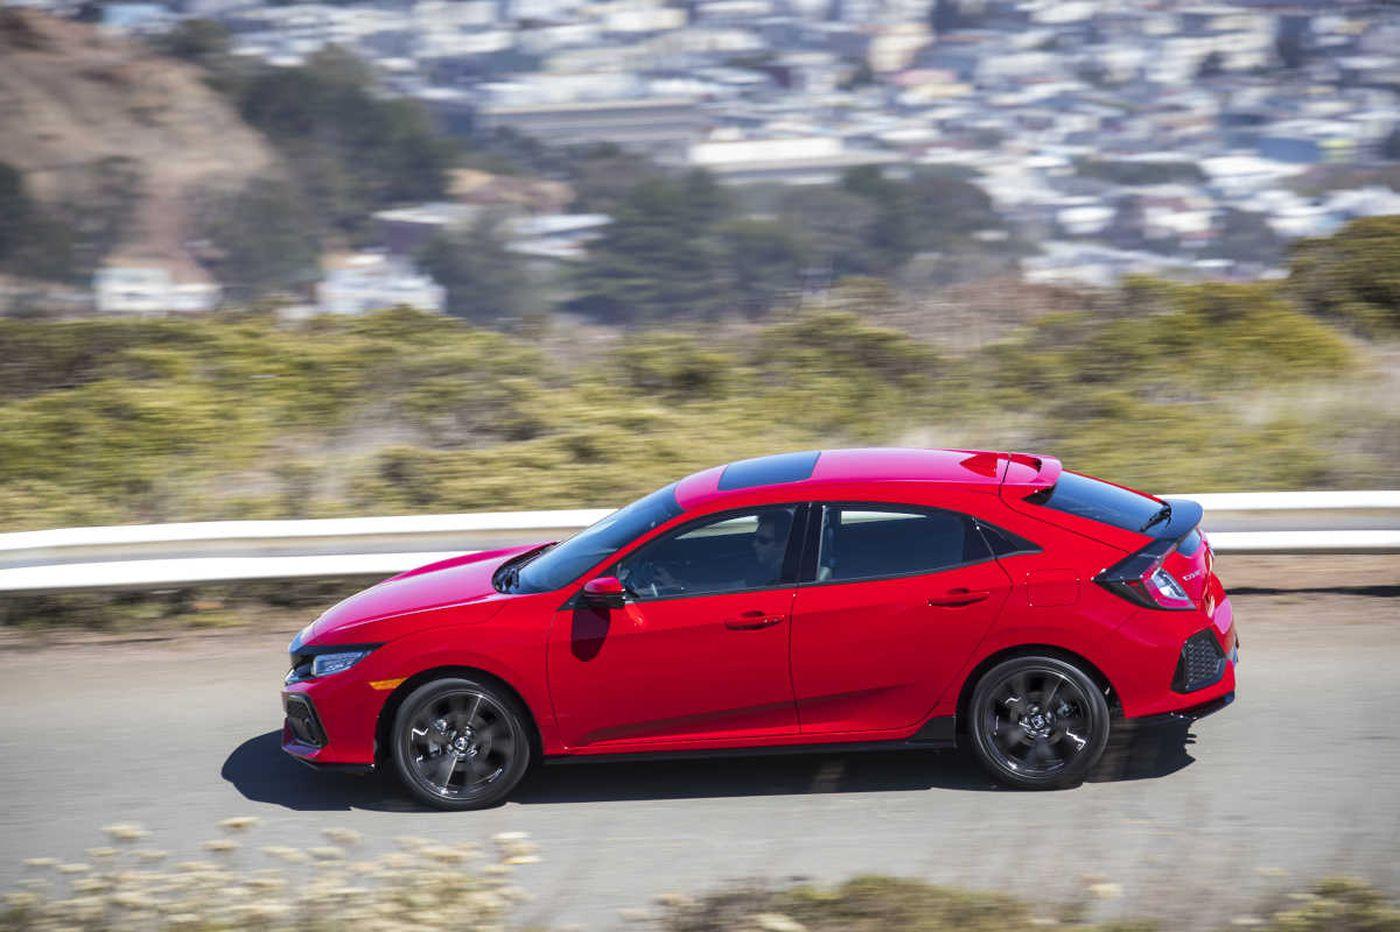 Honda Civic Hatchback Sport opens up new possibilities